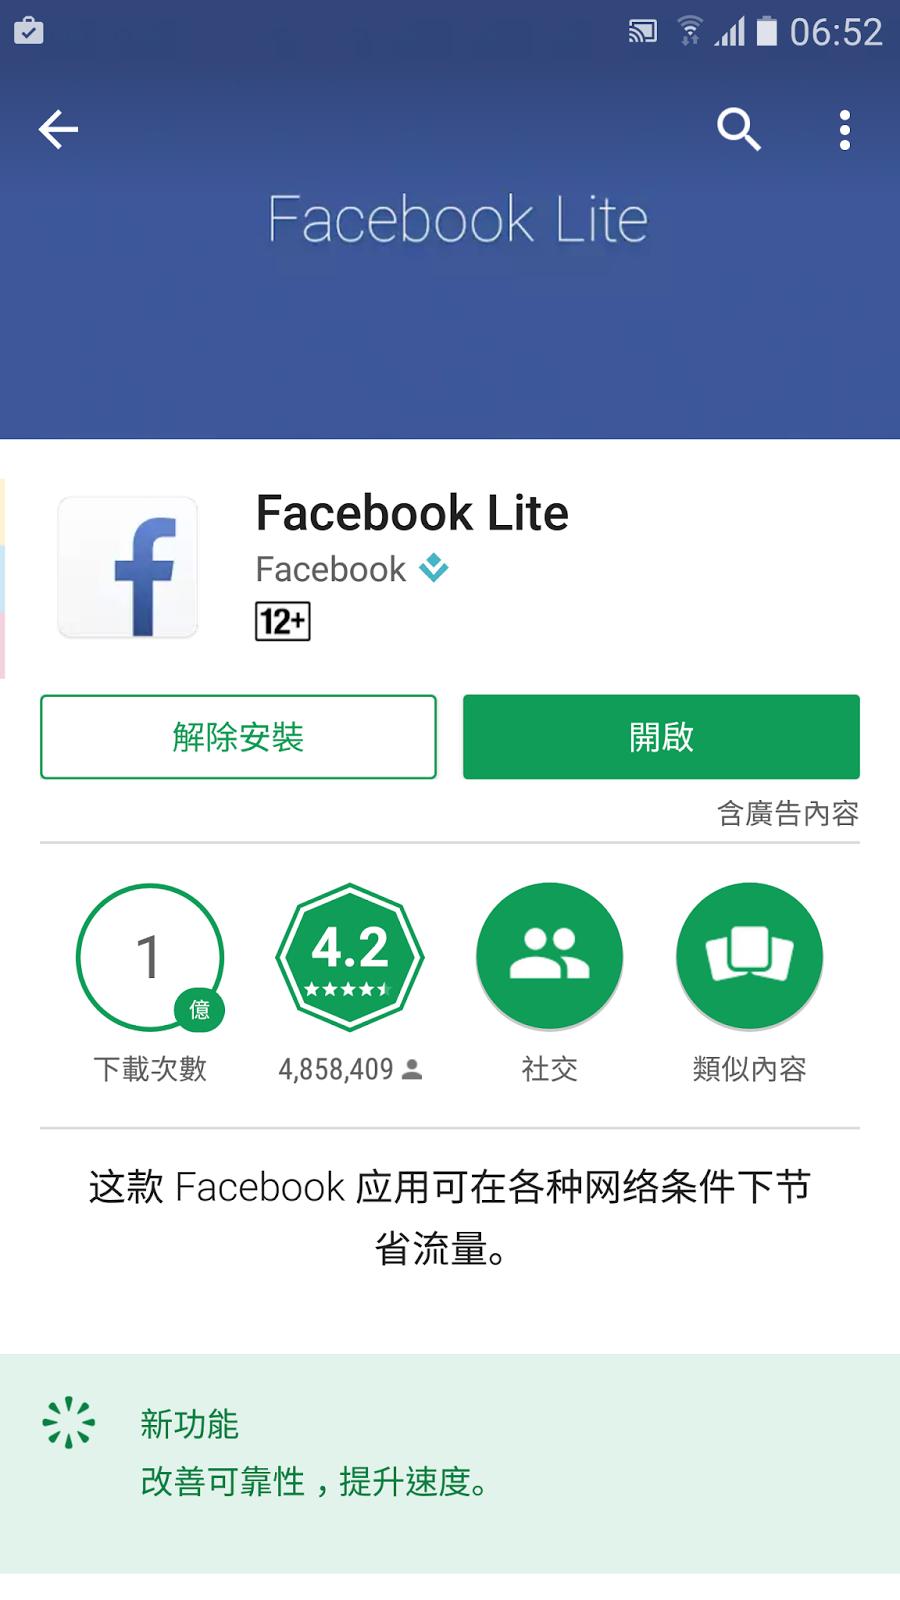 Facebook Lite 輕量版開放臺灣下載,如果你有需要,簡測省電省流量與速度